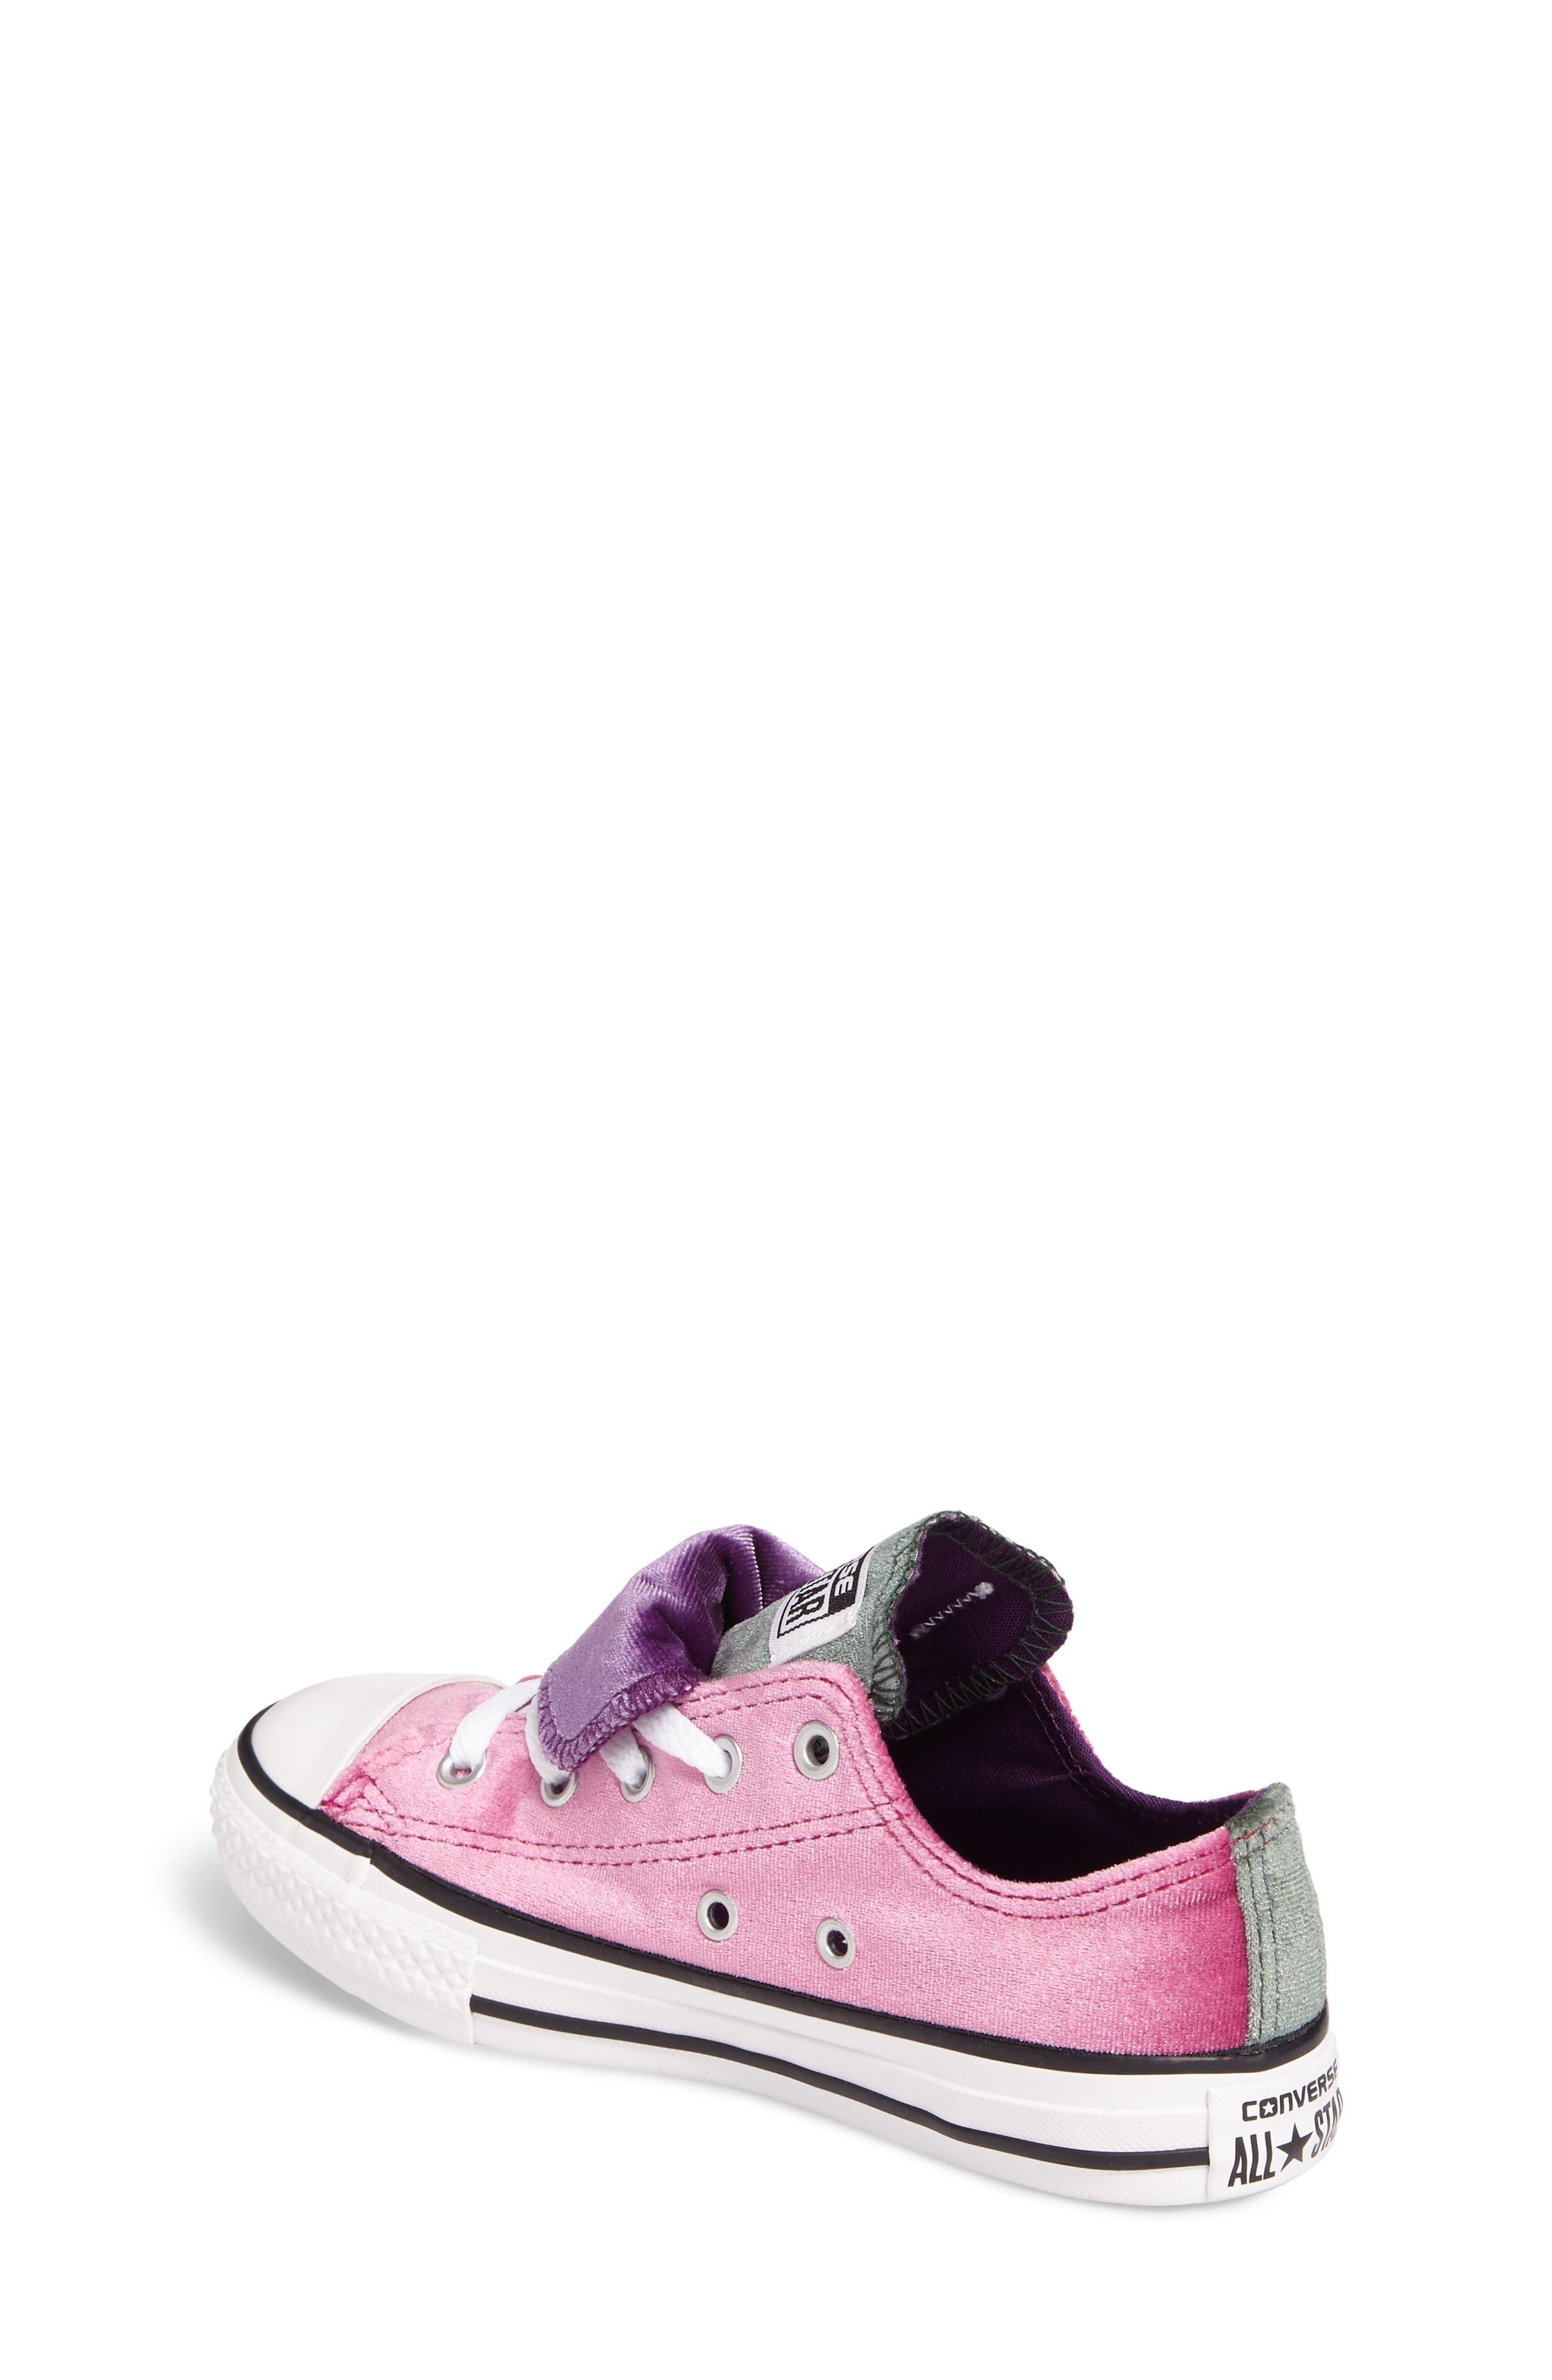 All Star<sup>®</sup> Velvet Double Tongue Sneaker,                             Alternate thumbnail 2, color,